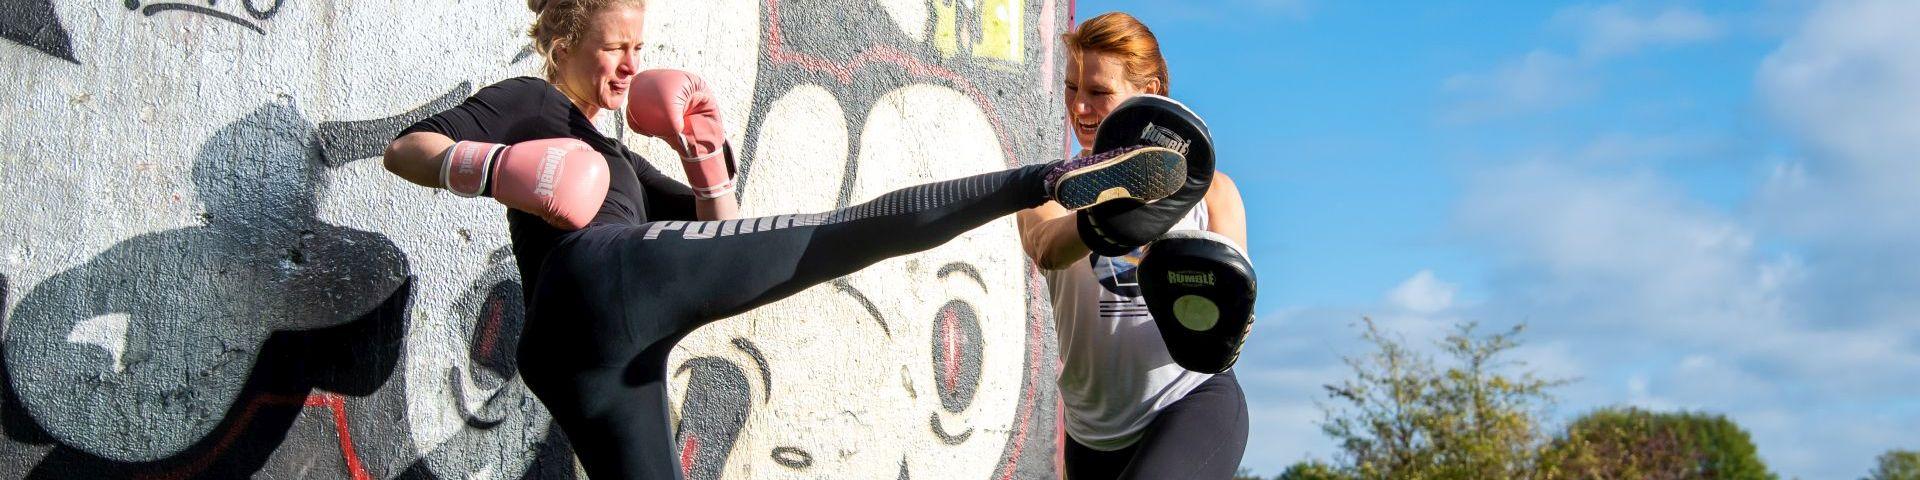 Boksfun - Banner_Leefstijlcoach-Wageningen-Ede-Bennekom-yoga-coaching-personal-training_DSC_3742